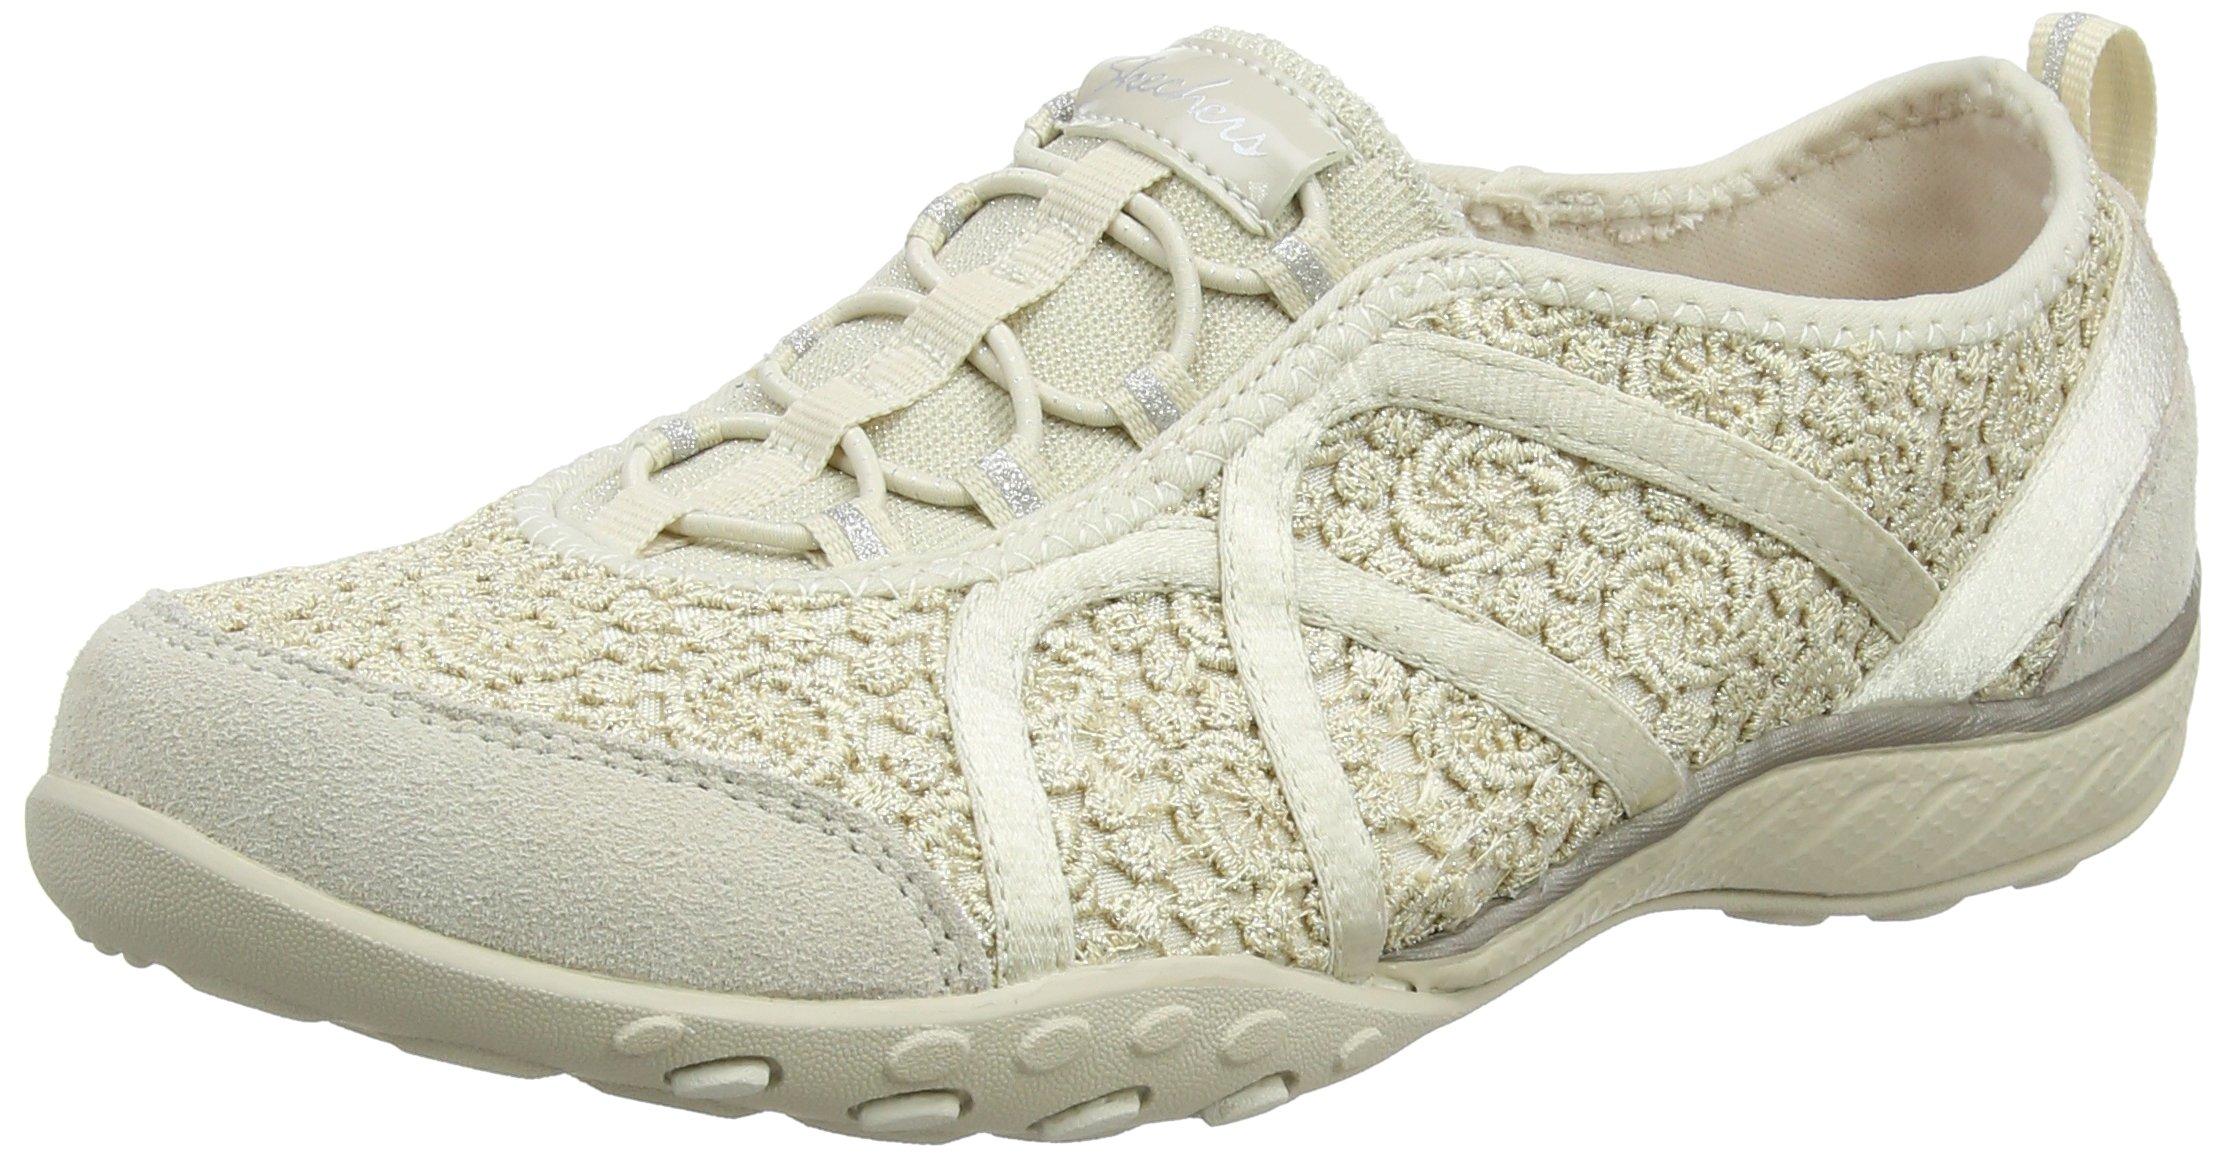 Skechers Women Breathe-Easy-Sweet Darling Low-Top Sneakers, Beige (Natural/Silver), 6 UK 39 EU